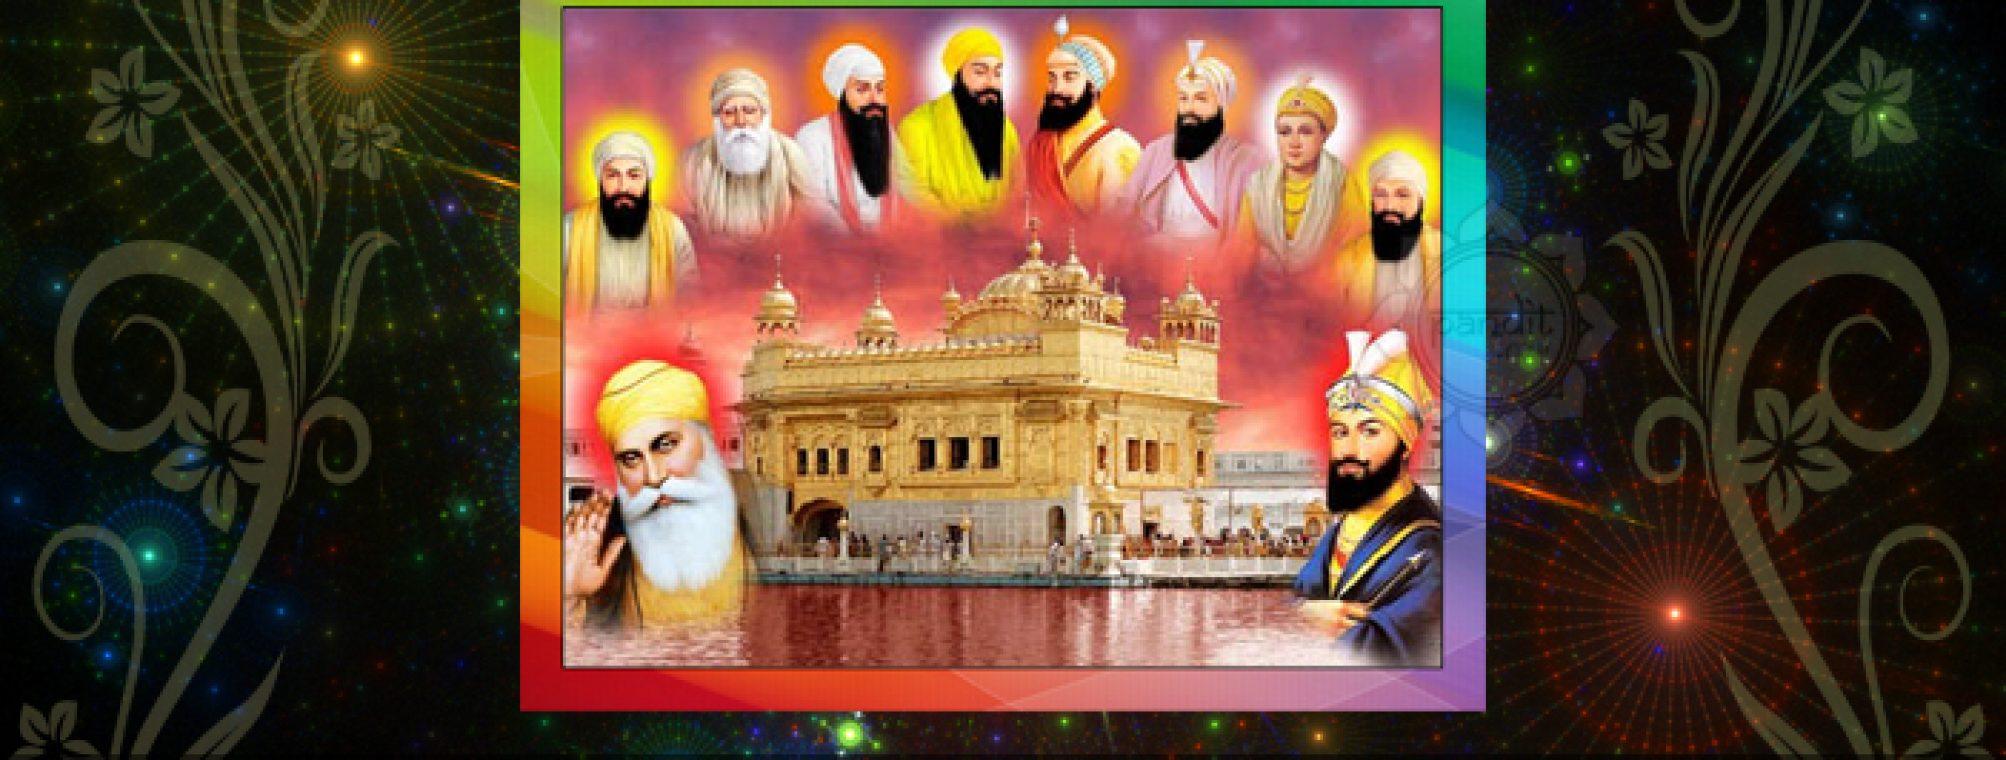 Sikh Festivals 2020  Pandit pertaining to Sikh Jantri 2020